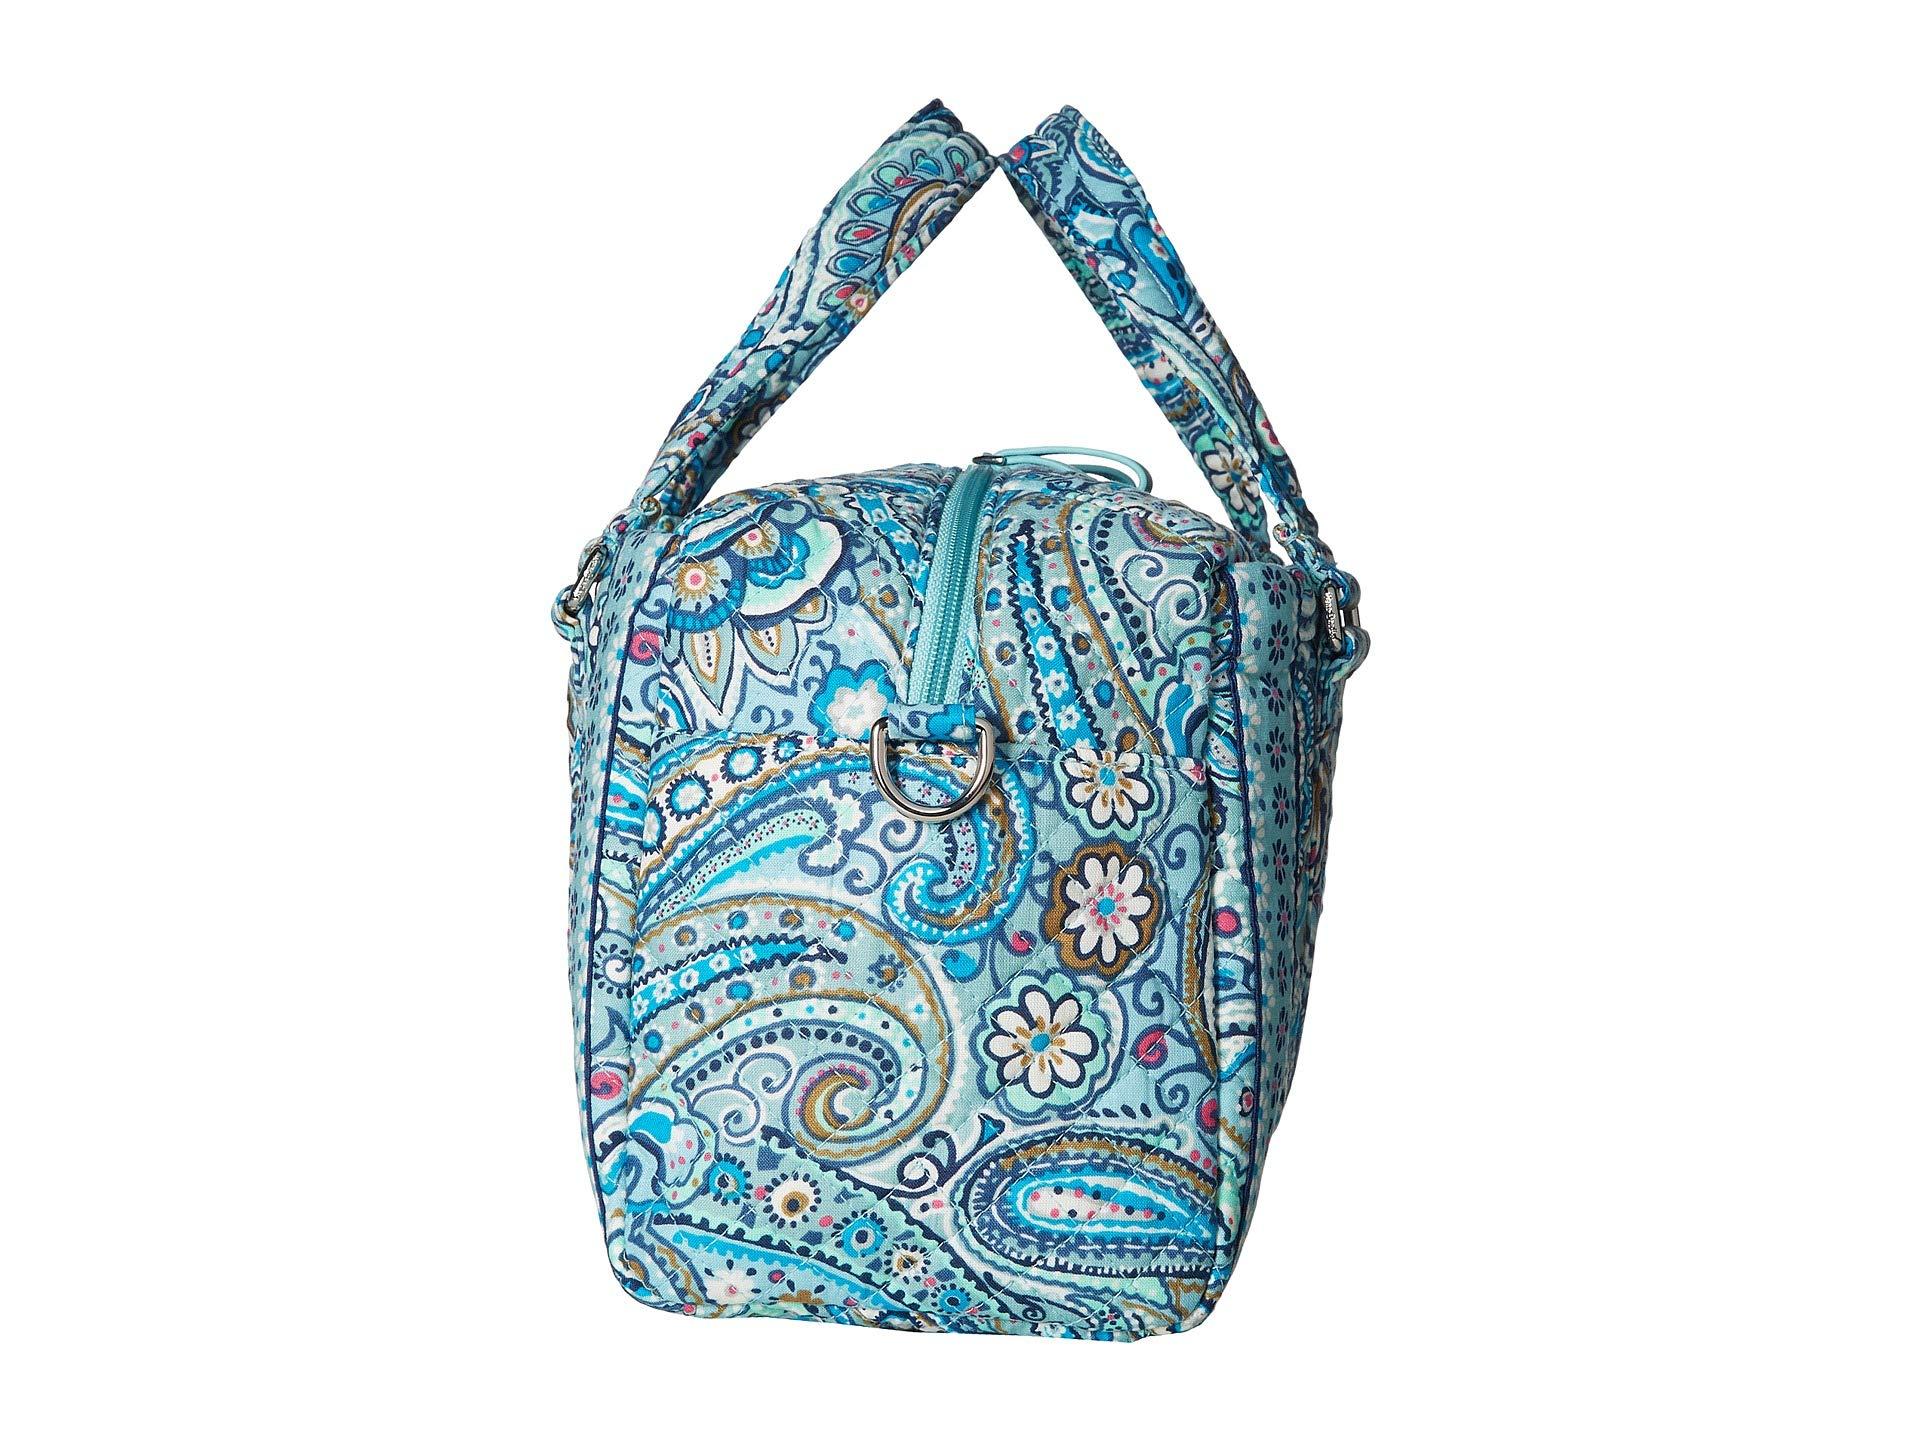 Paisley 100 Daisy Handbag Vera Iconic Dot Bradley pTB6qWFwnU